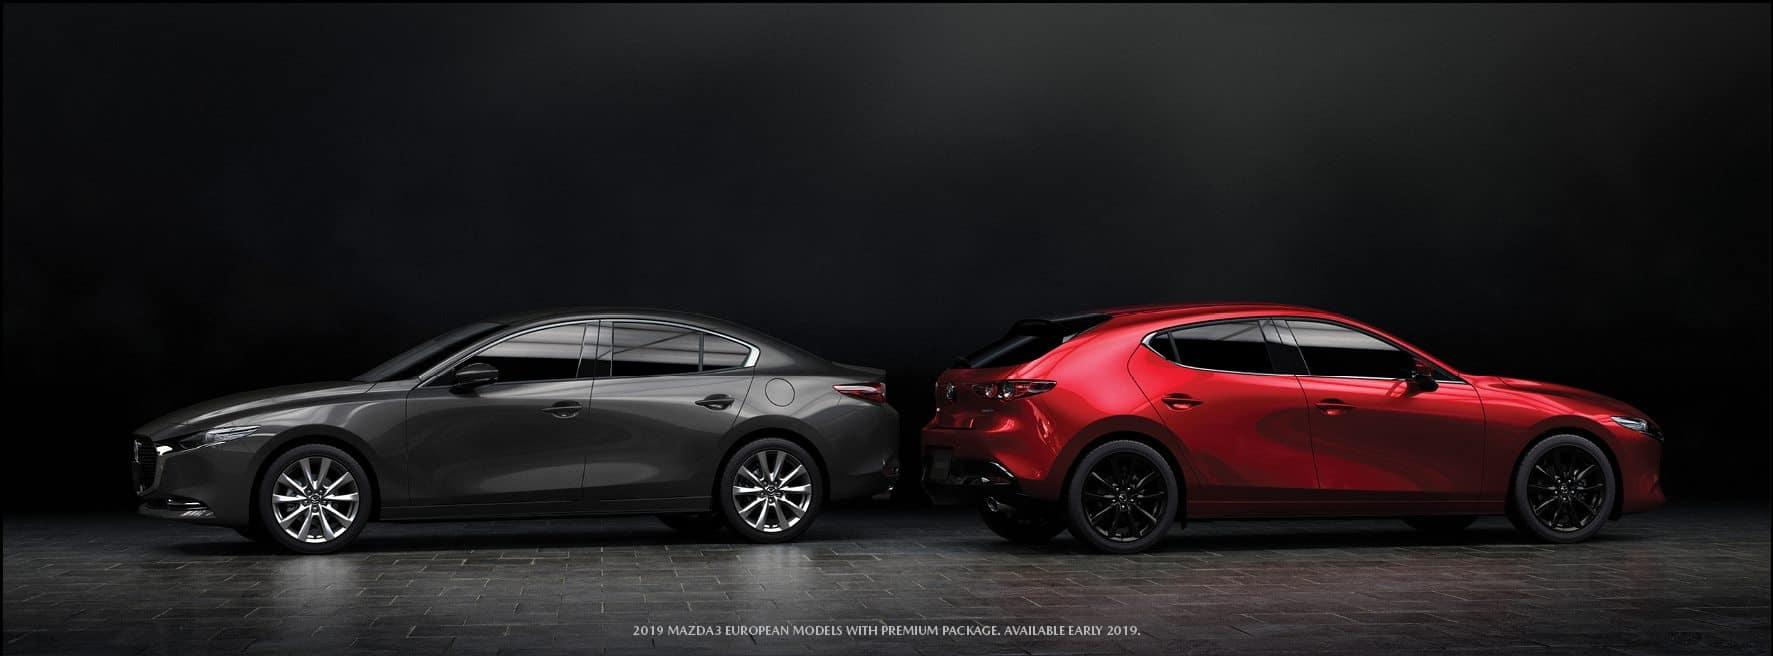 Staten Island Mazda